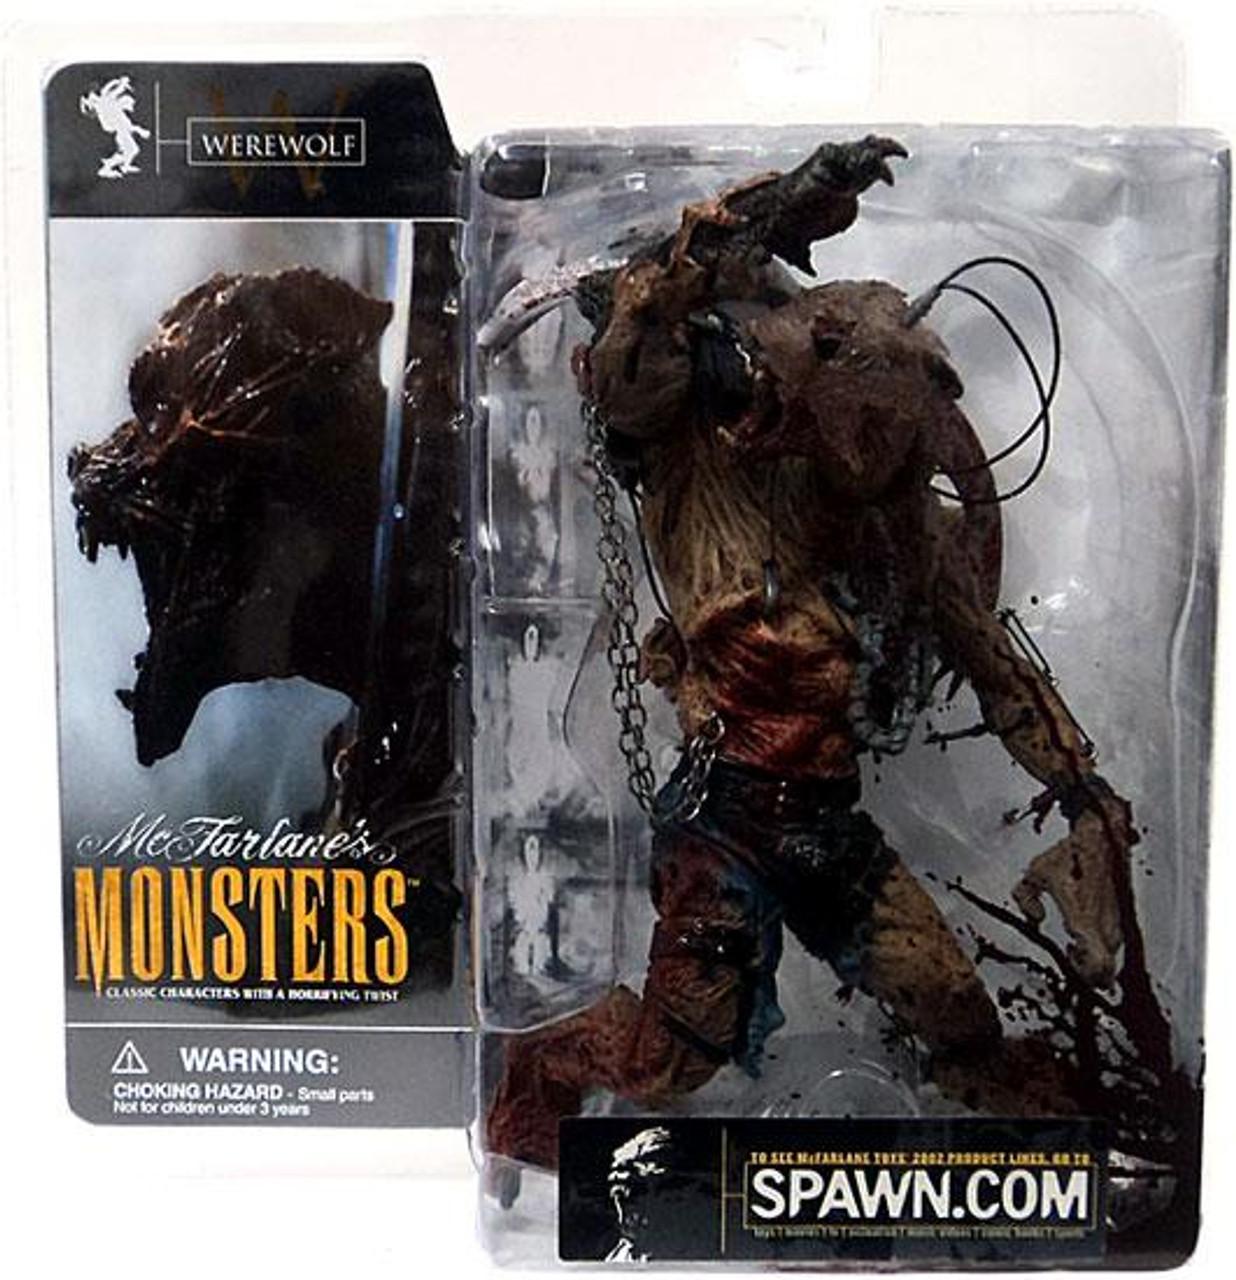 McFarlane Toys McFarlane's Monsters Werewolf Action Figure [Blood Splattered Package Variant]